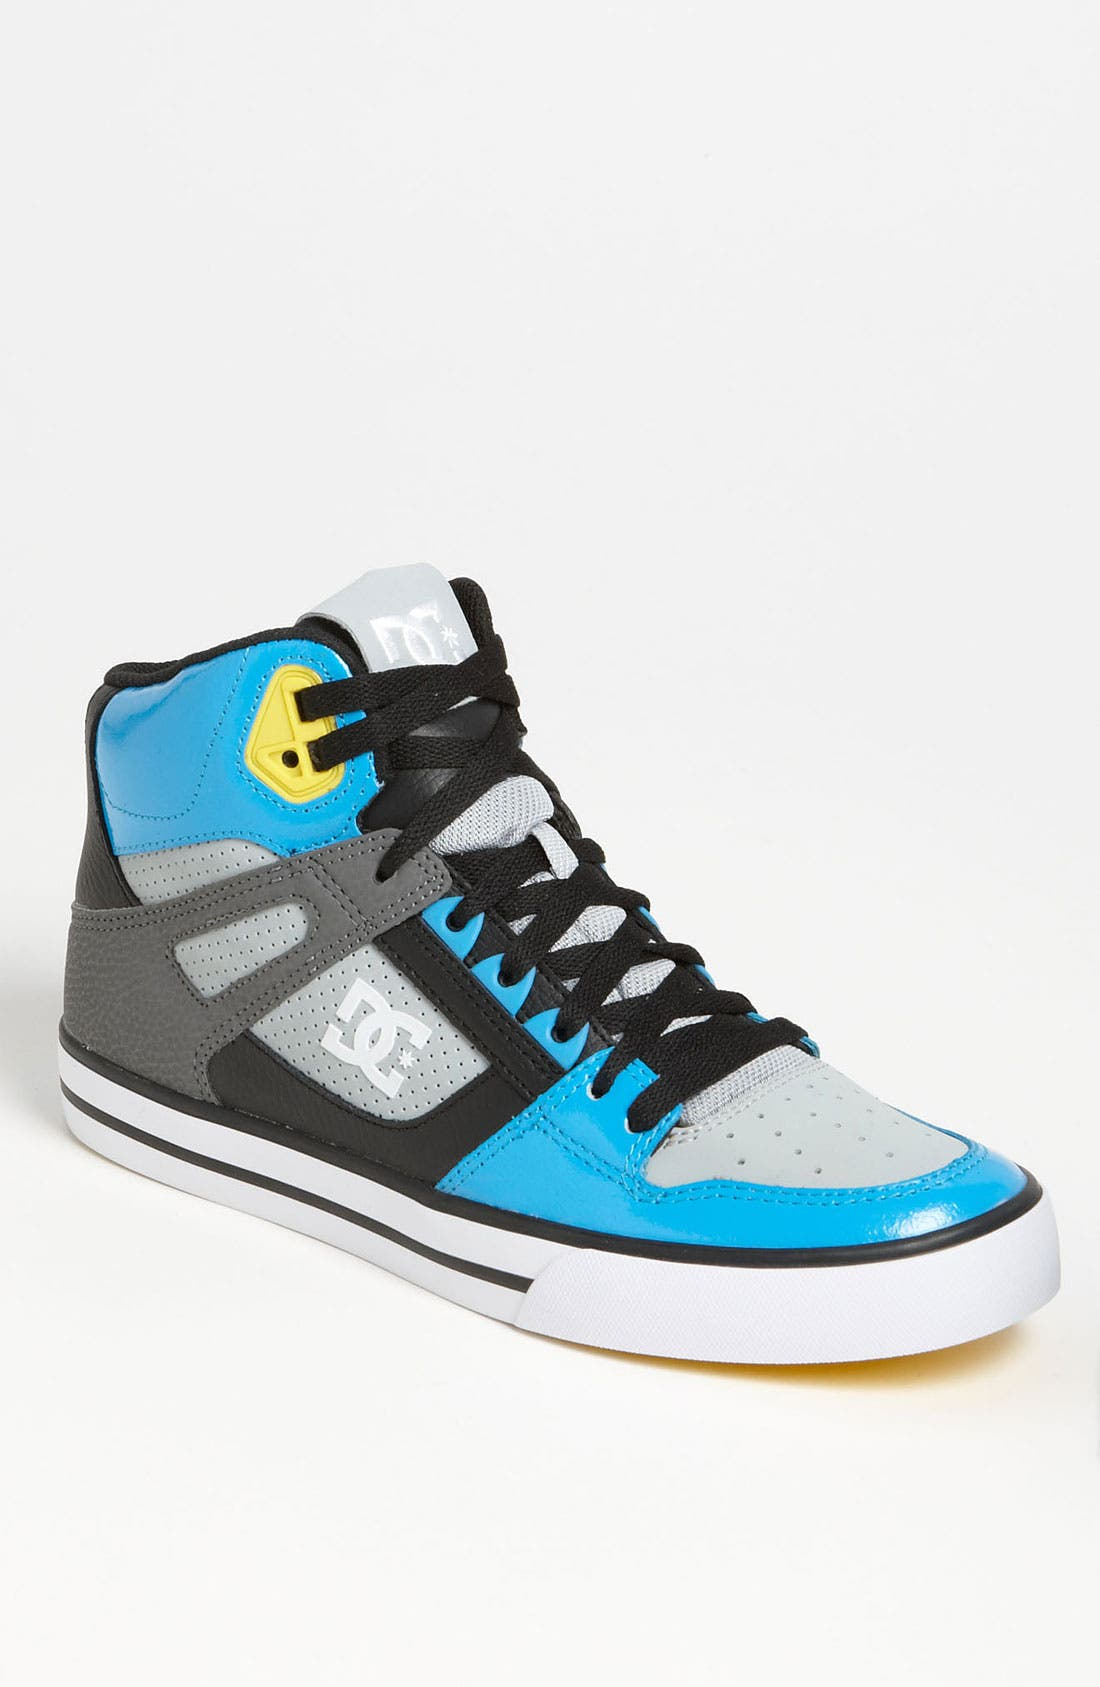 Alternate Image 1 Selected - DC Shoes 'Spartan Hi' Sneaker (Online Only)